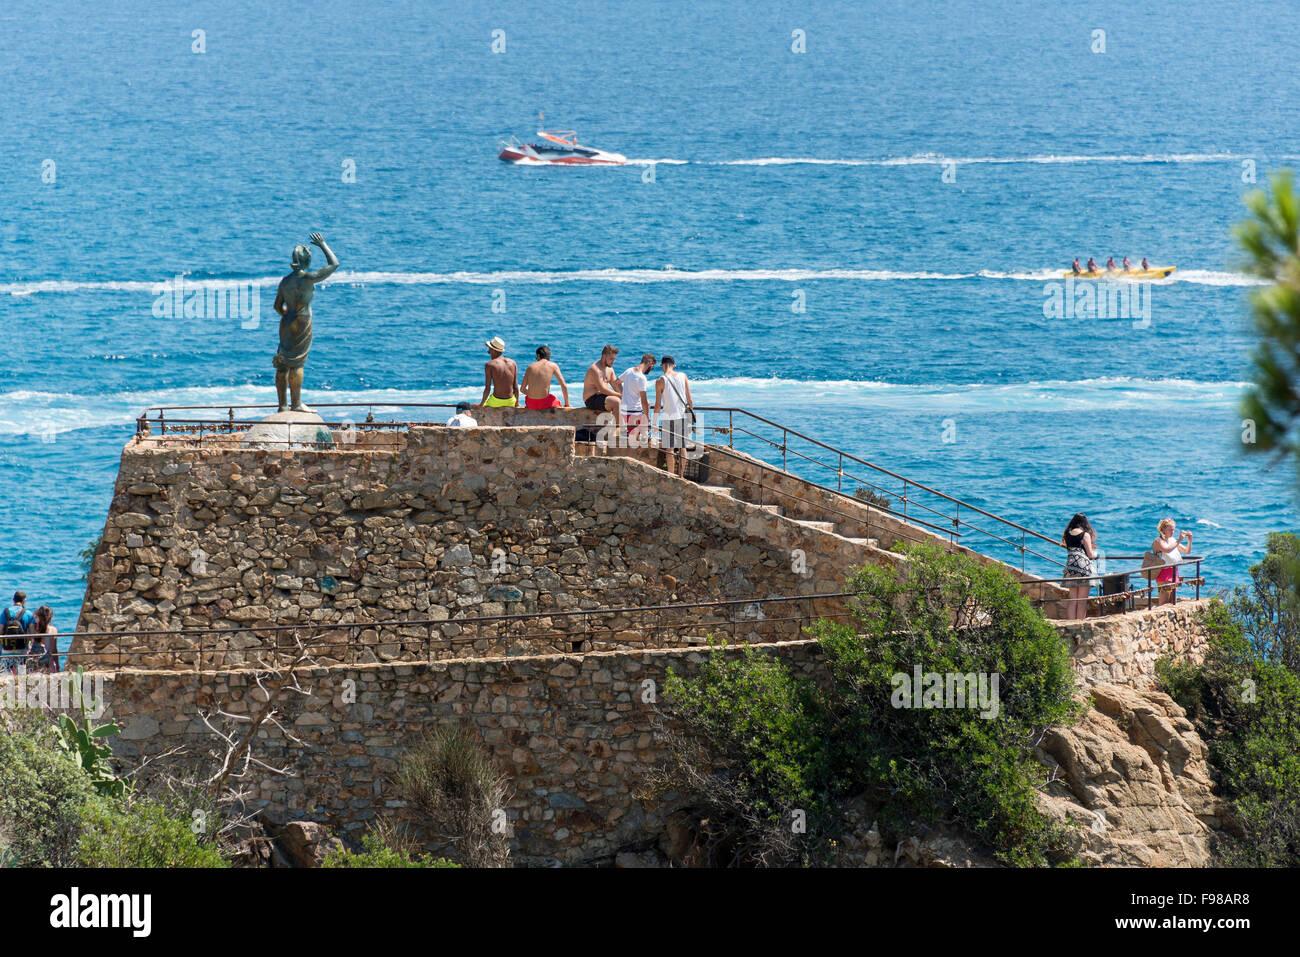 Monument to the Fisherman's Wife, Lloret de Mar, Costa Brava, Province of Girona, Catalonia, Spain - Stock Image